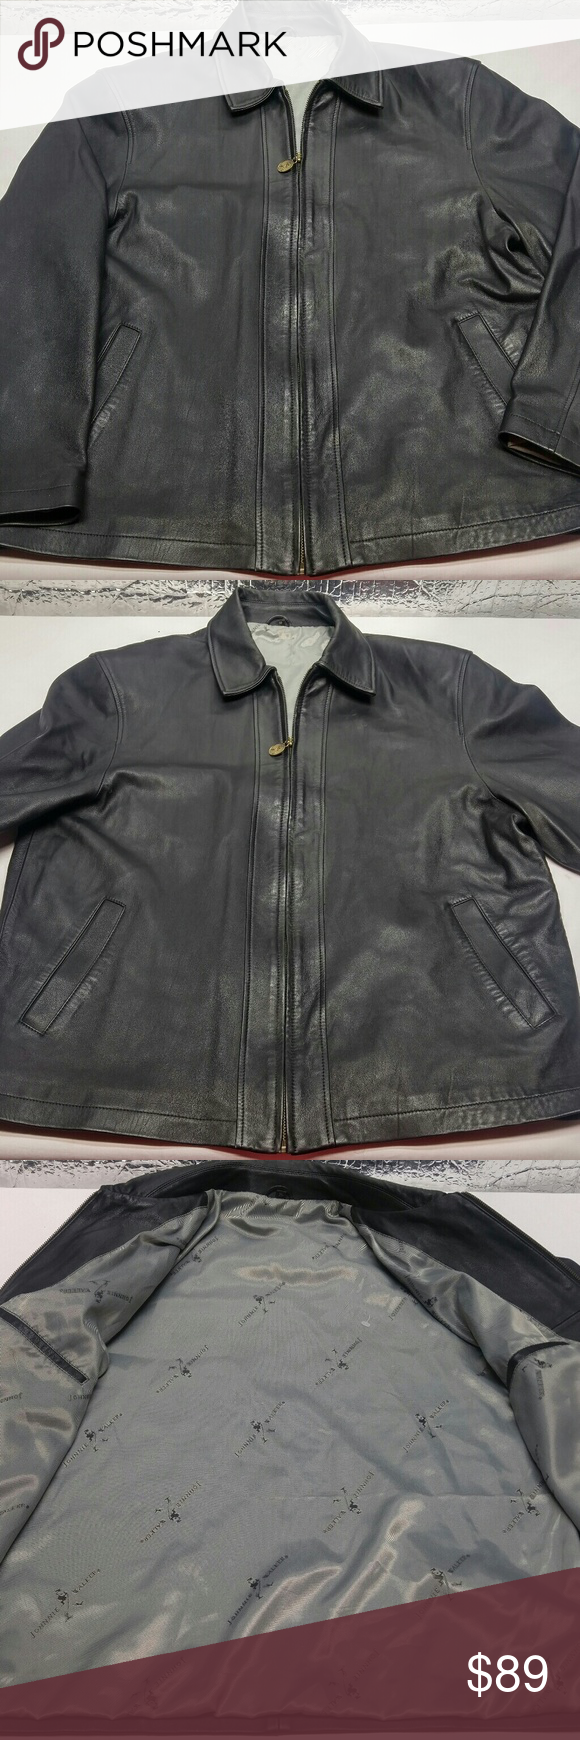 Jonnie Walker Whiskey Sleek Quality Leather Jacket Great